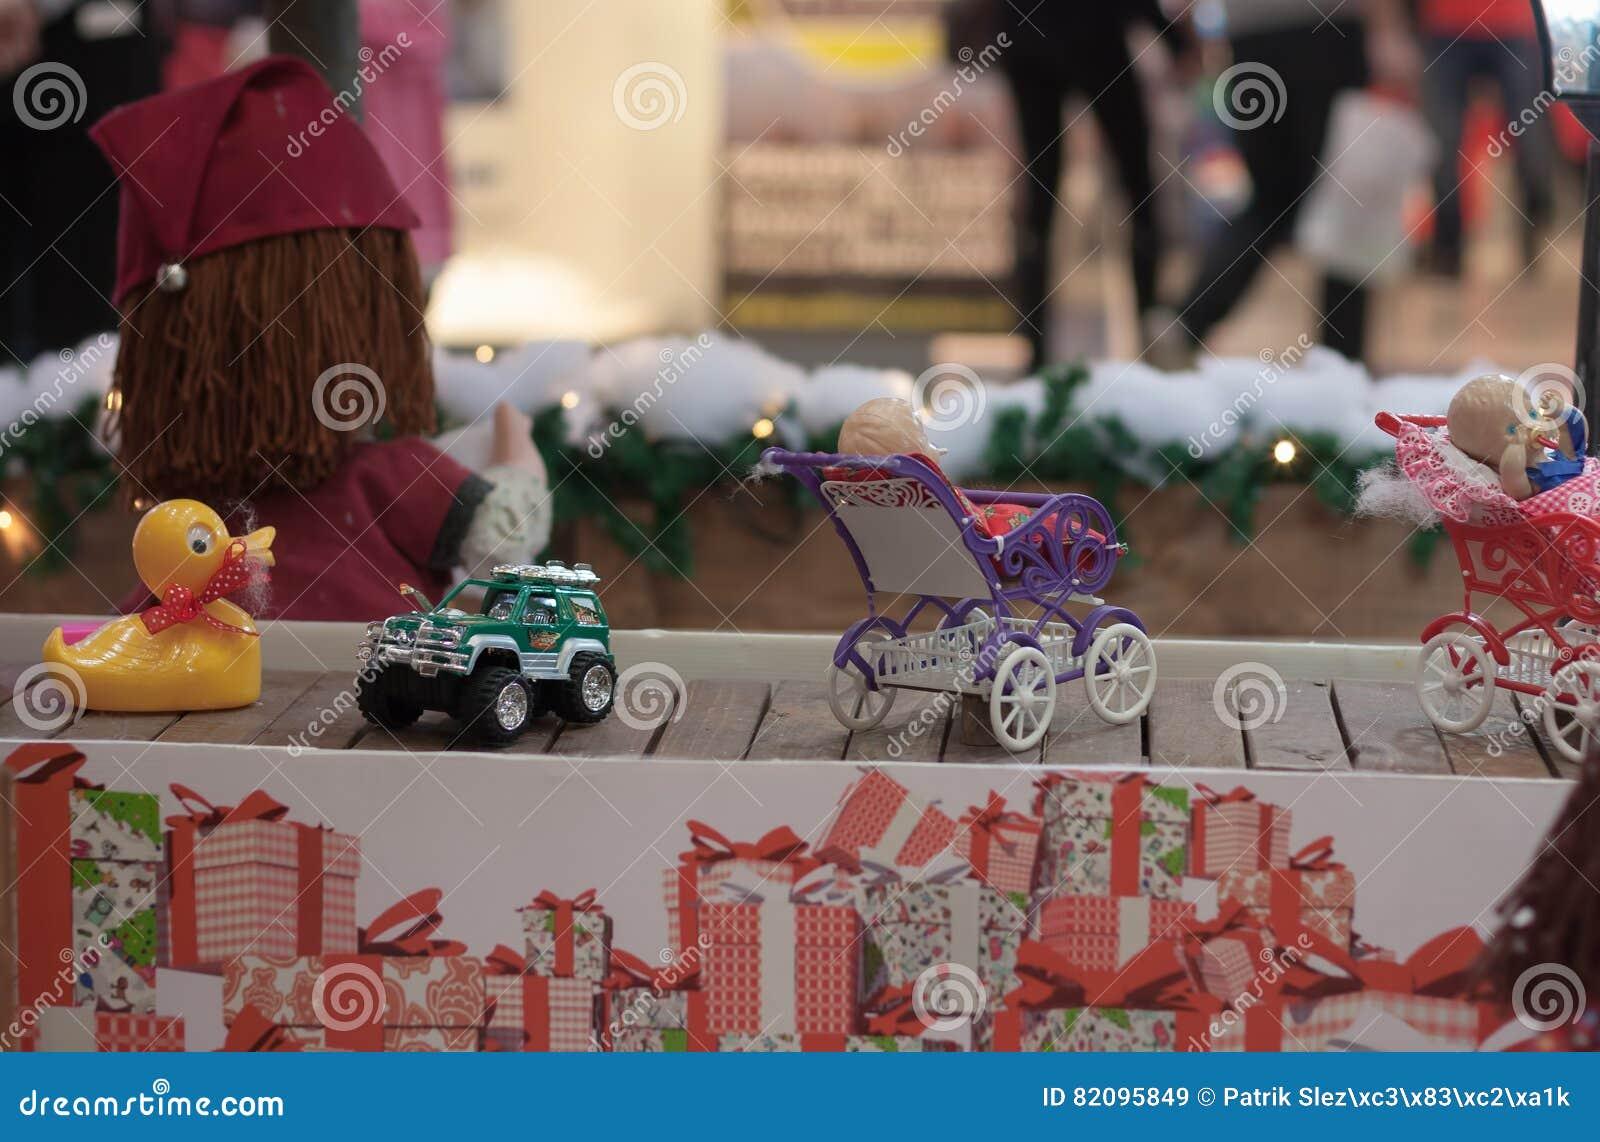 Miniature Toys On Conveyor Belt In Shopping Center Editorial Stock